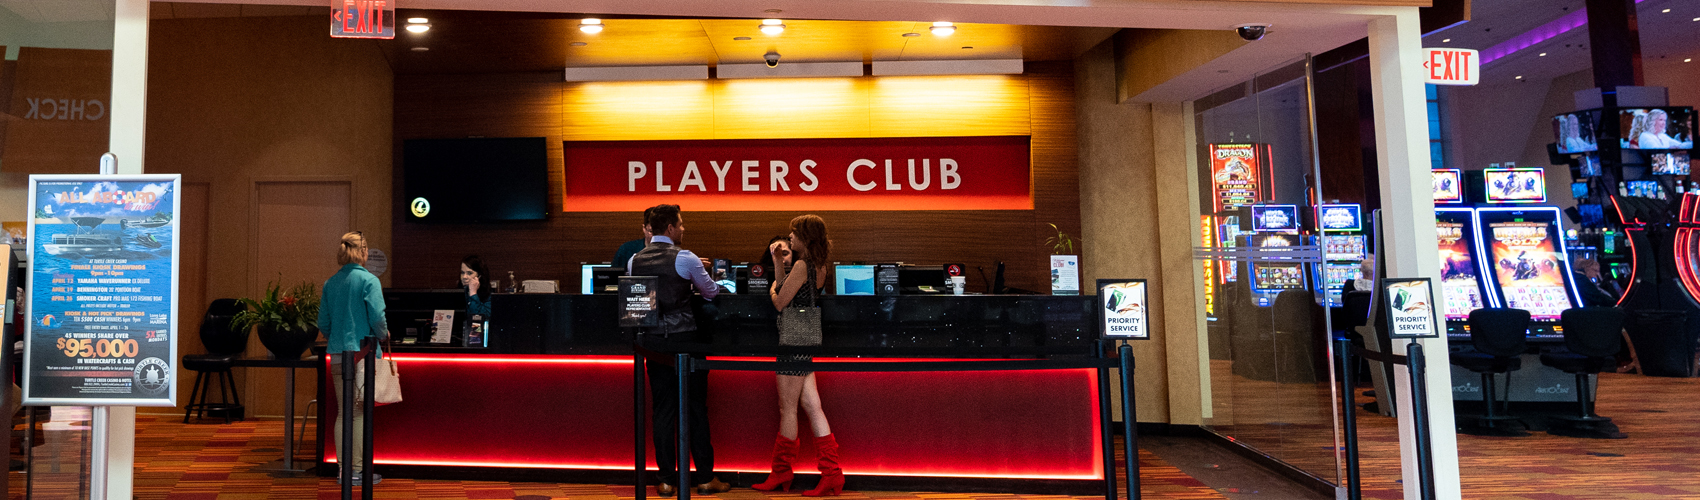 Turtle creek casino marketing club player casino bonuses